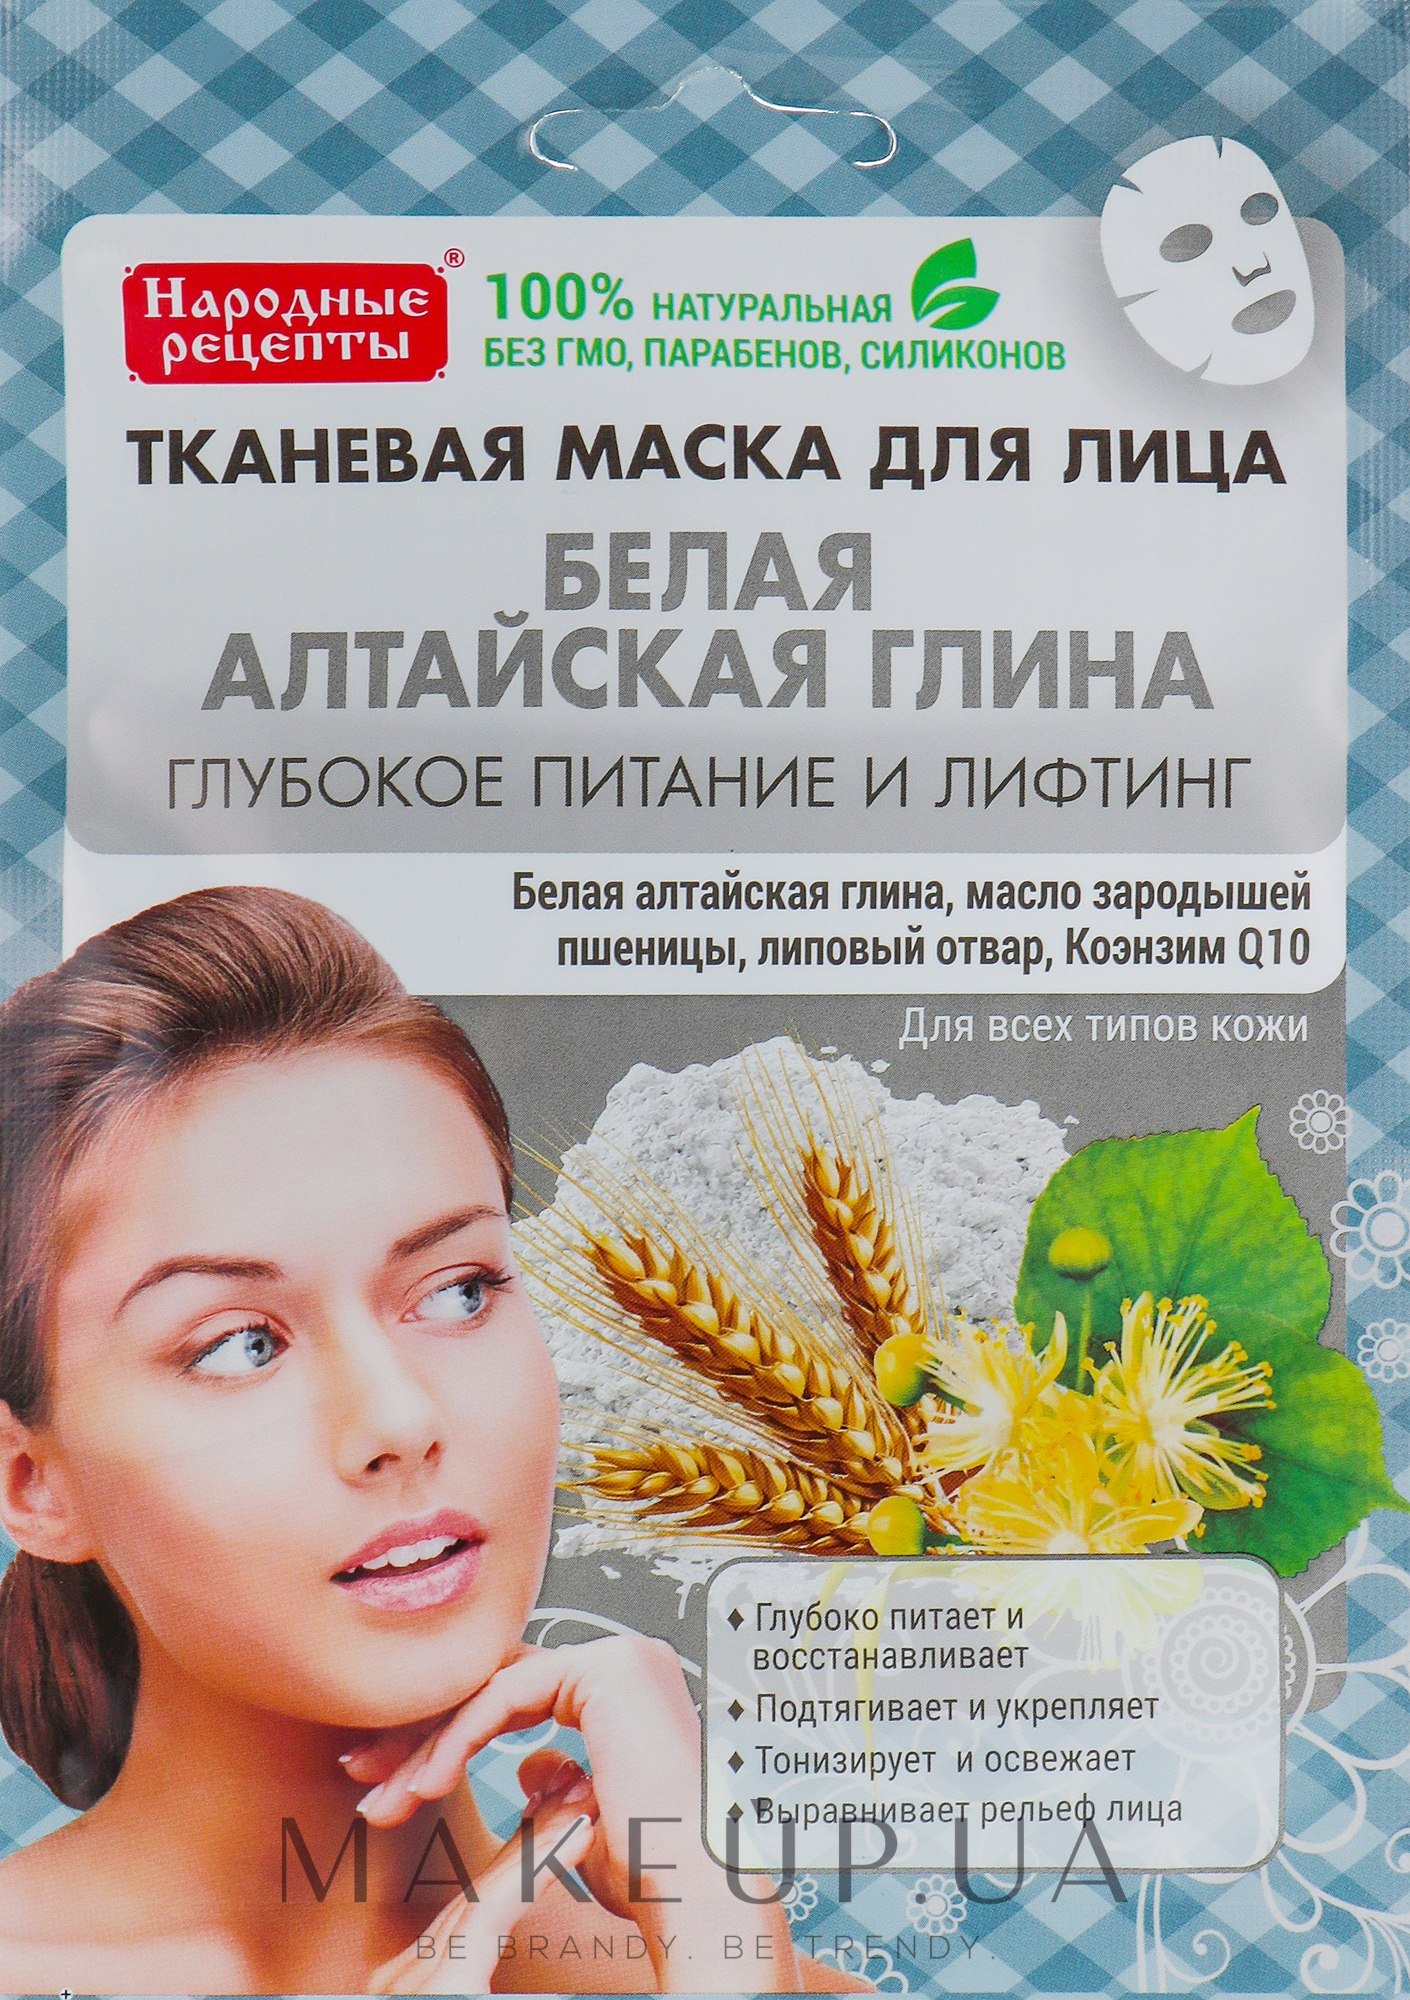 Косметика онмакабим купить украина hinoki косметика купить